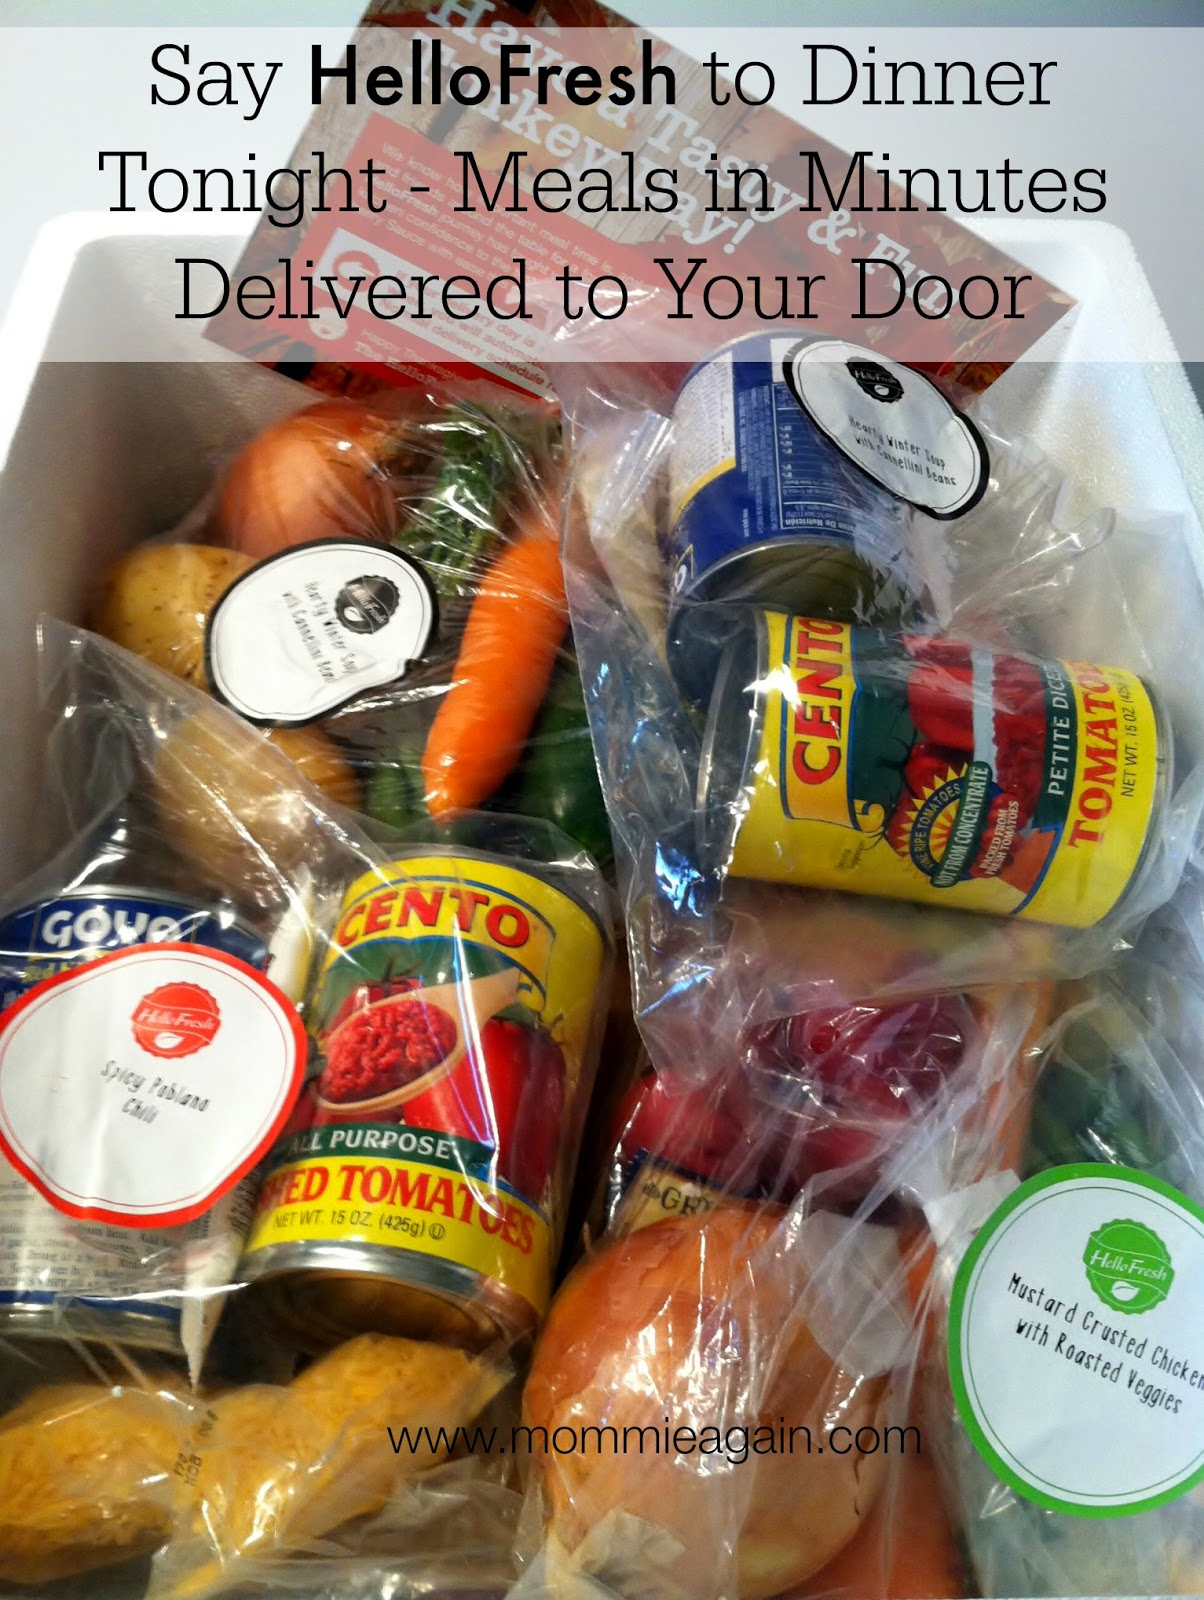 Food waste argumentative essay